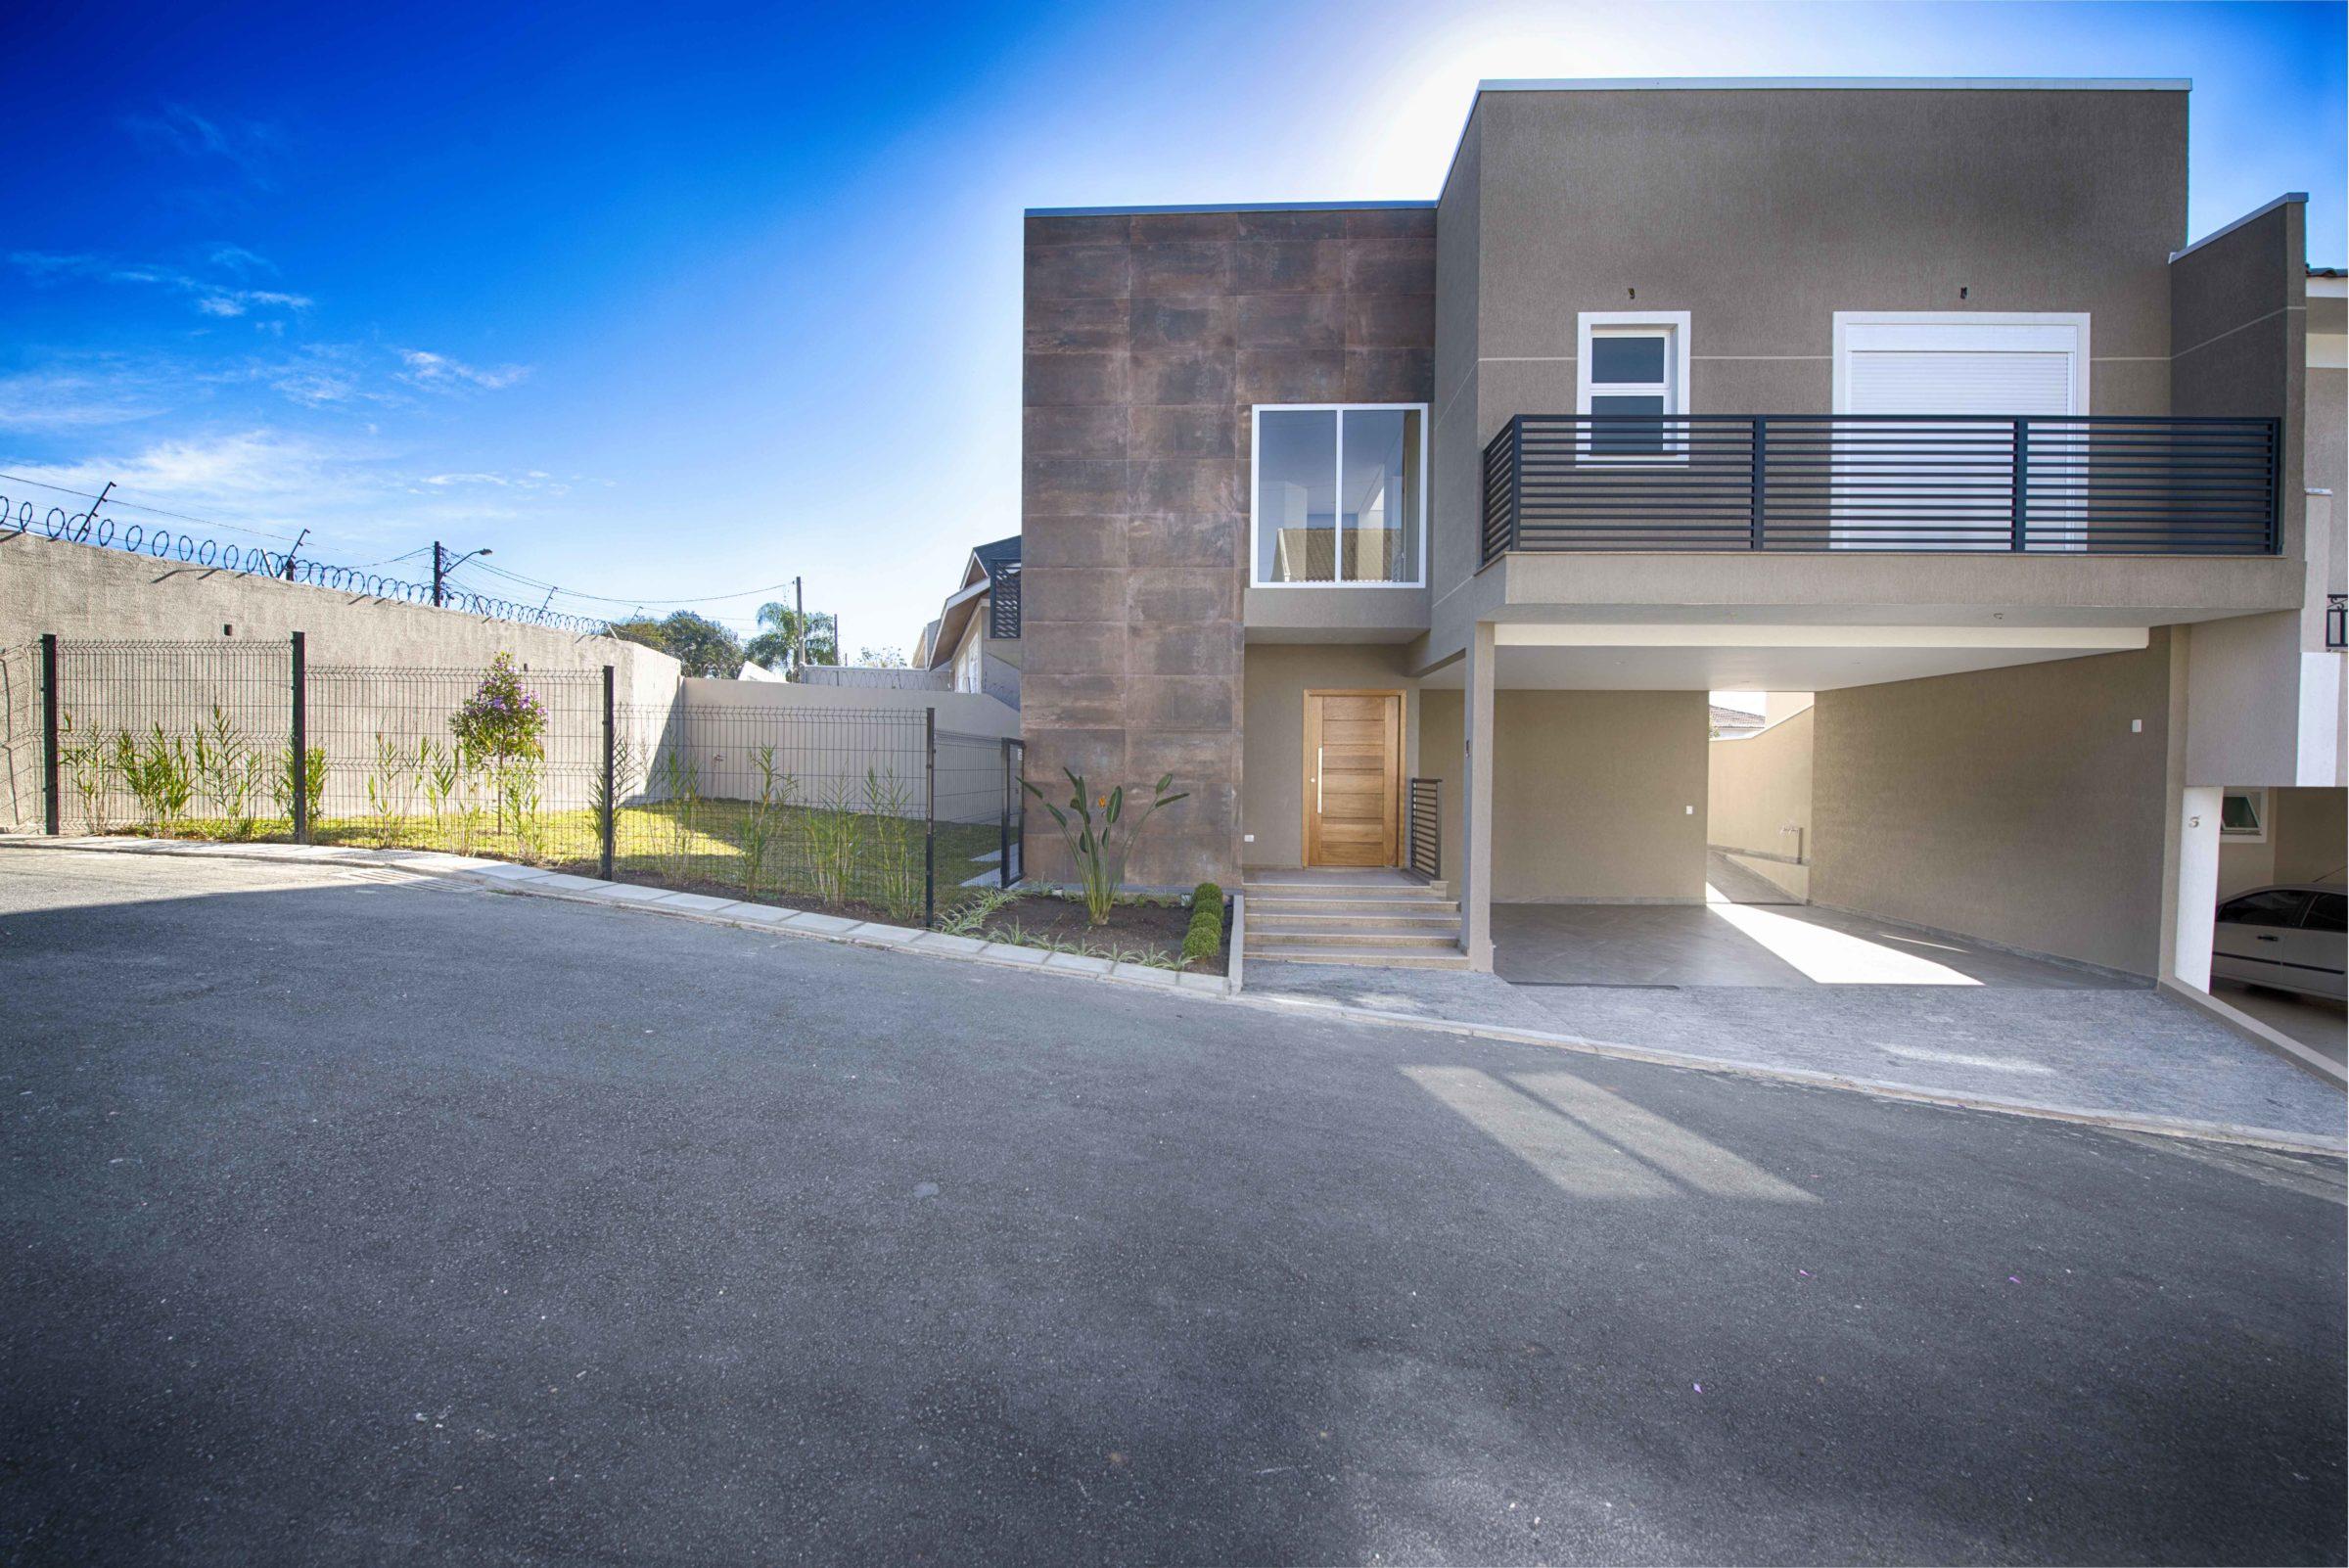 Fotos de Imóvel, Fotografia Imobiliaria fachada